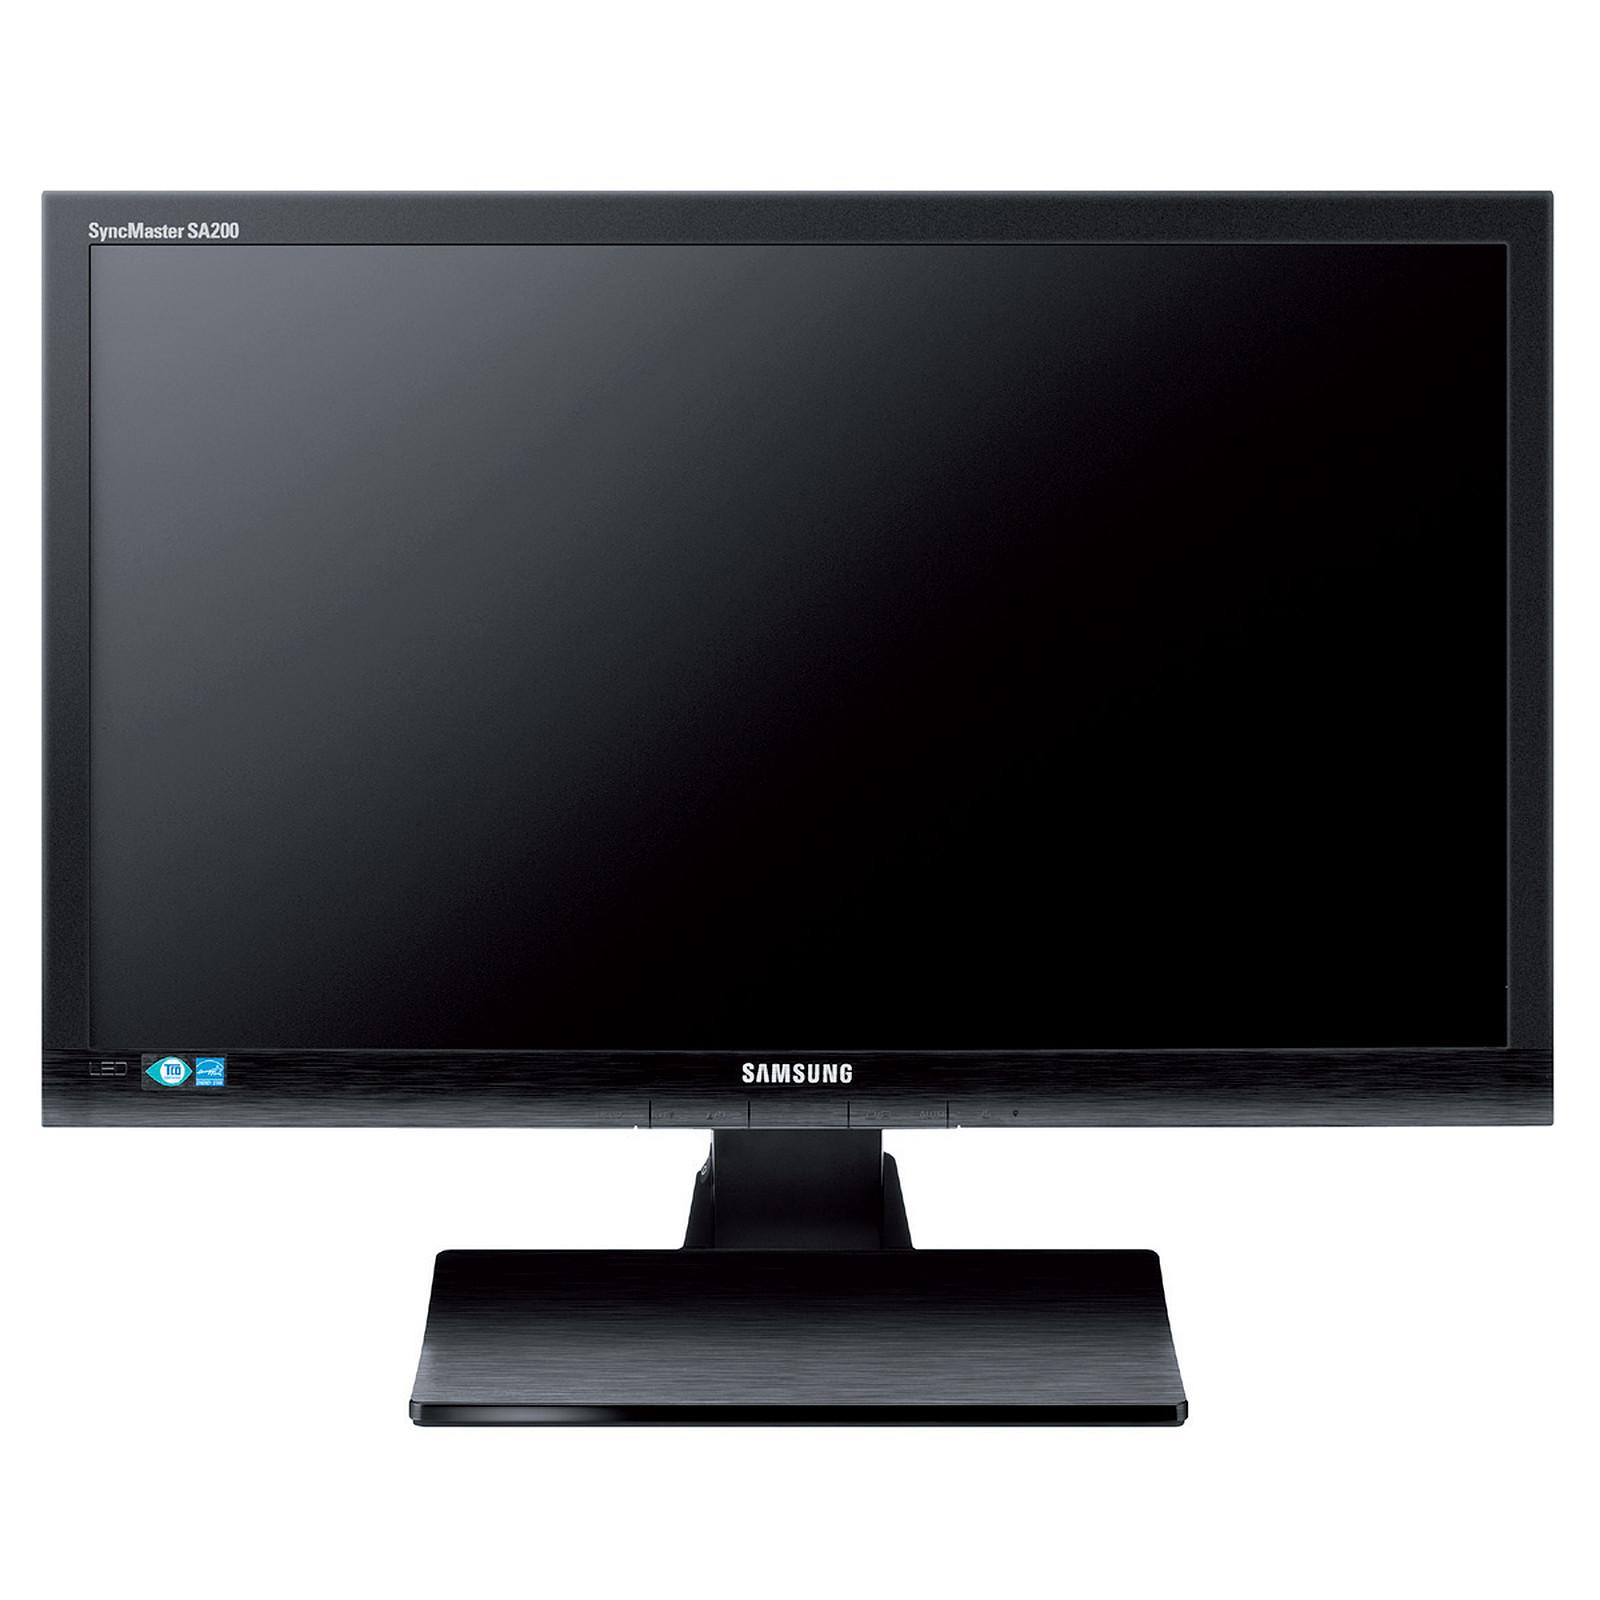 "Samsung 21.5"" LED - SyncMaster S22A200B"